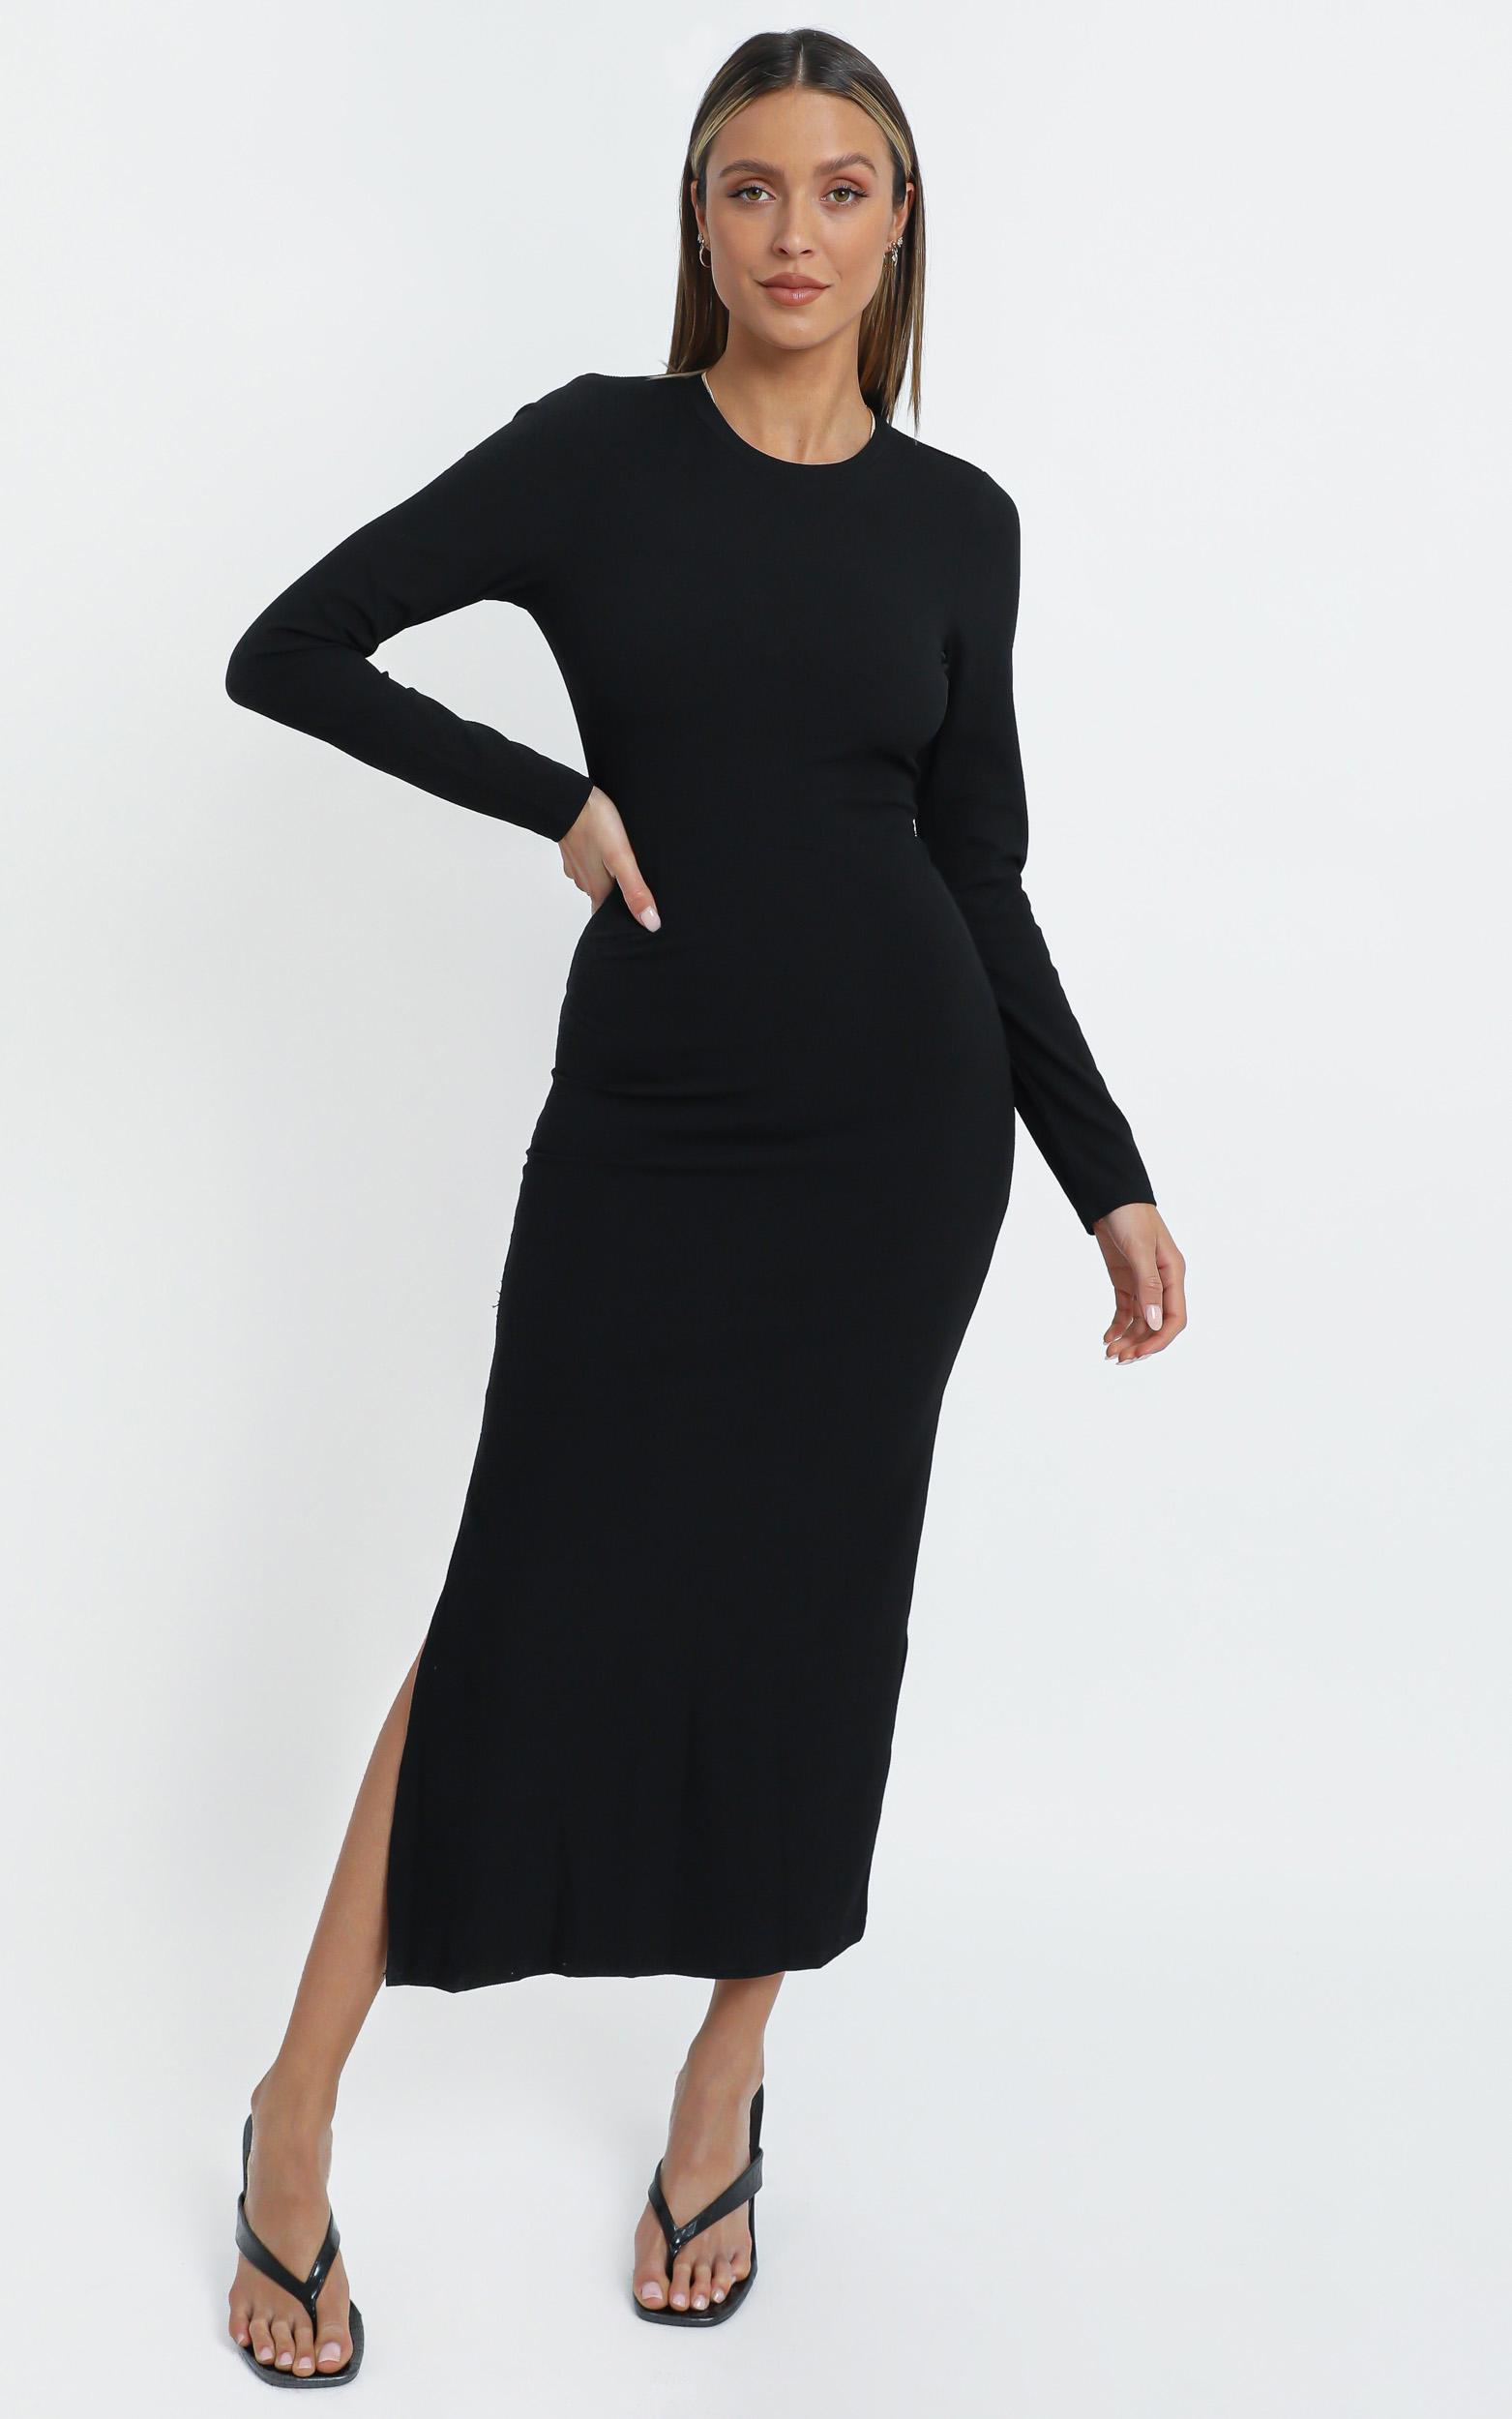 Kai Dress in Black - 14 (XL), Black, hi-res image number null